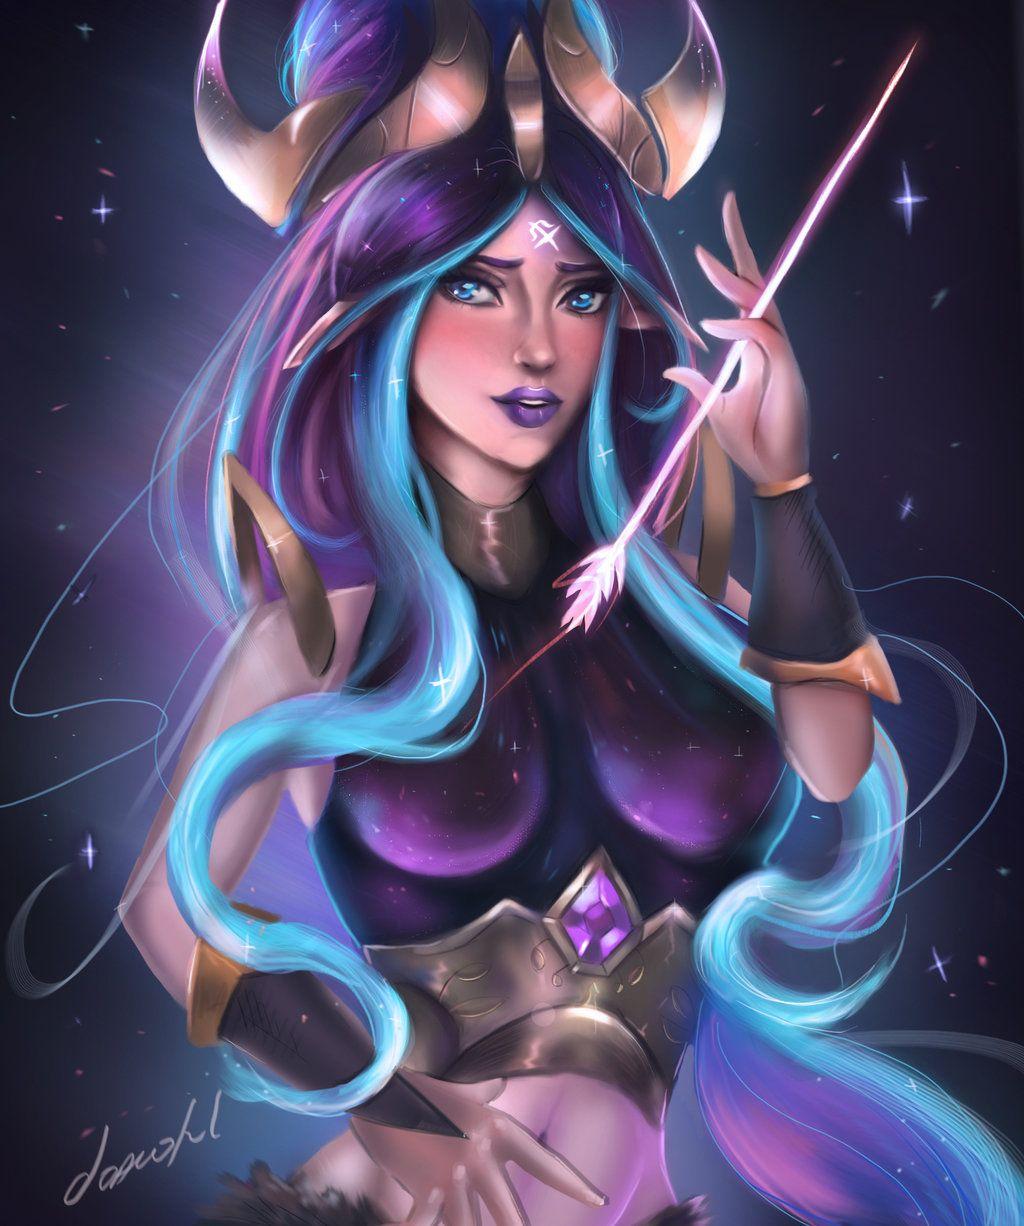 Magical Sagittarius Sagittarius Art Art Anime Art Girl